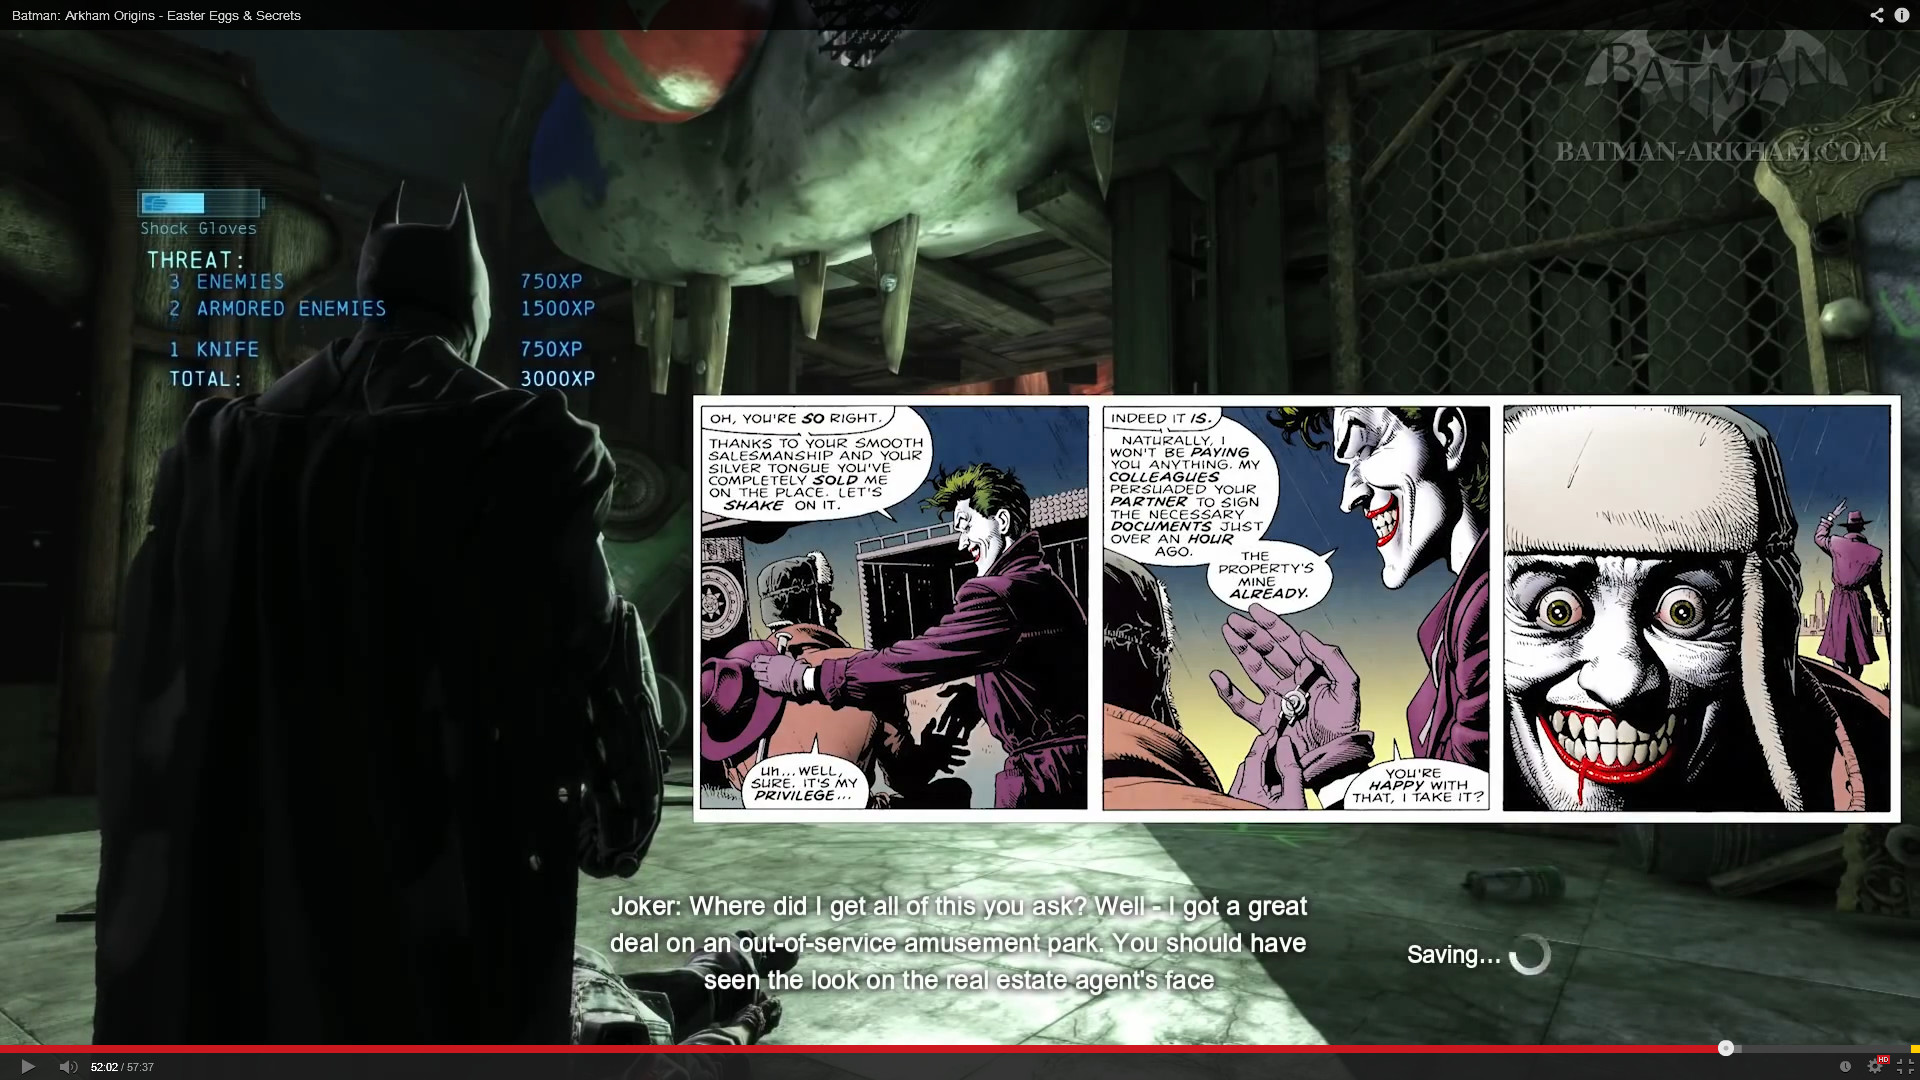 Killing Joke scene reference in Arkham Origins.png